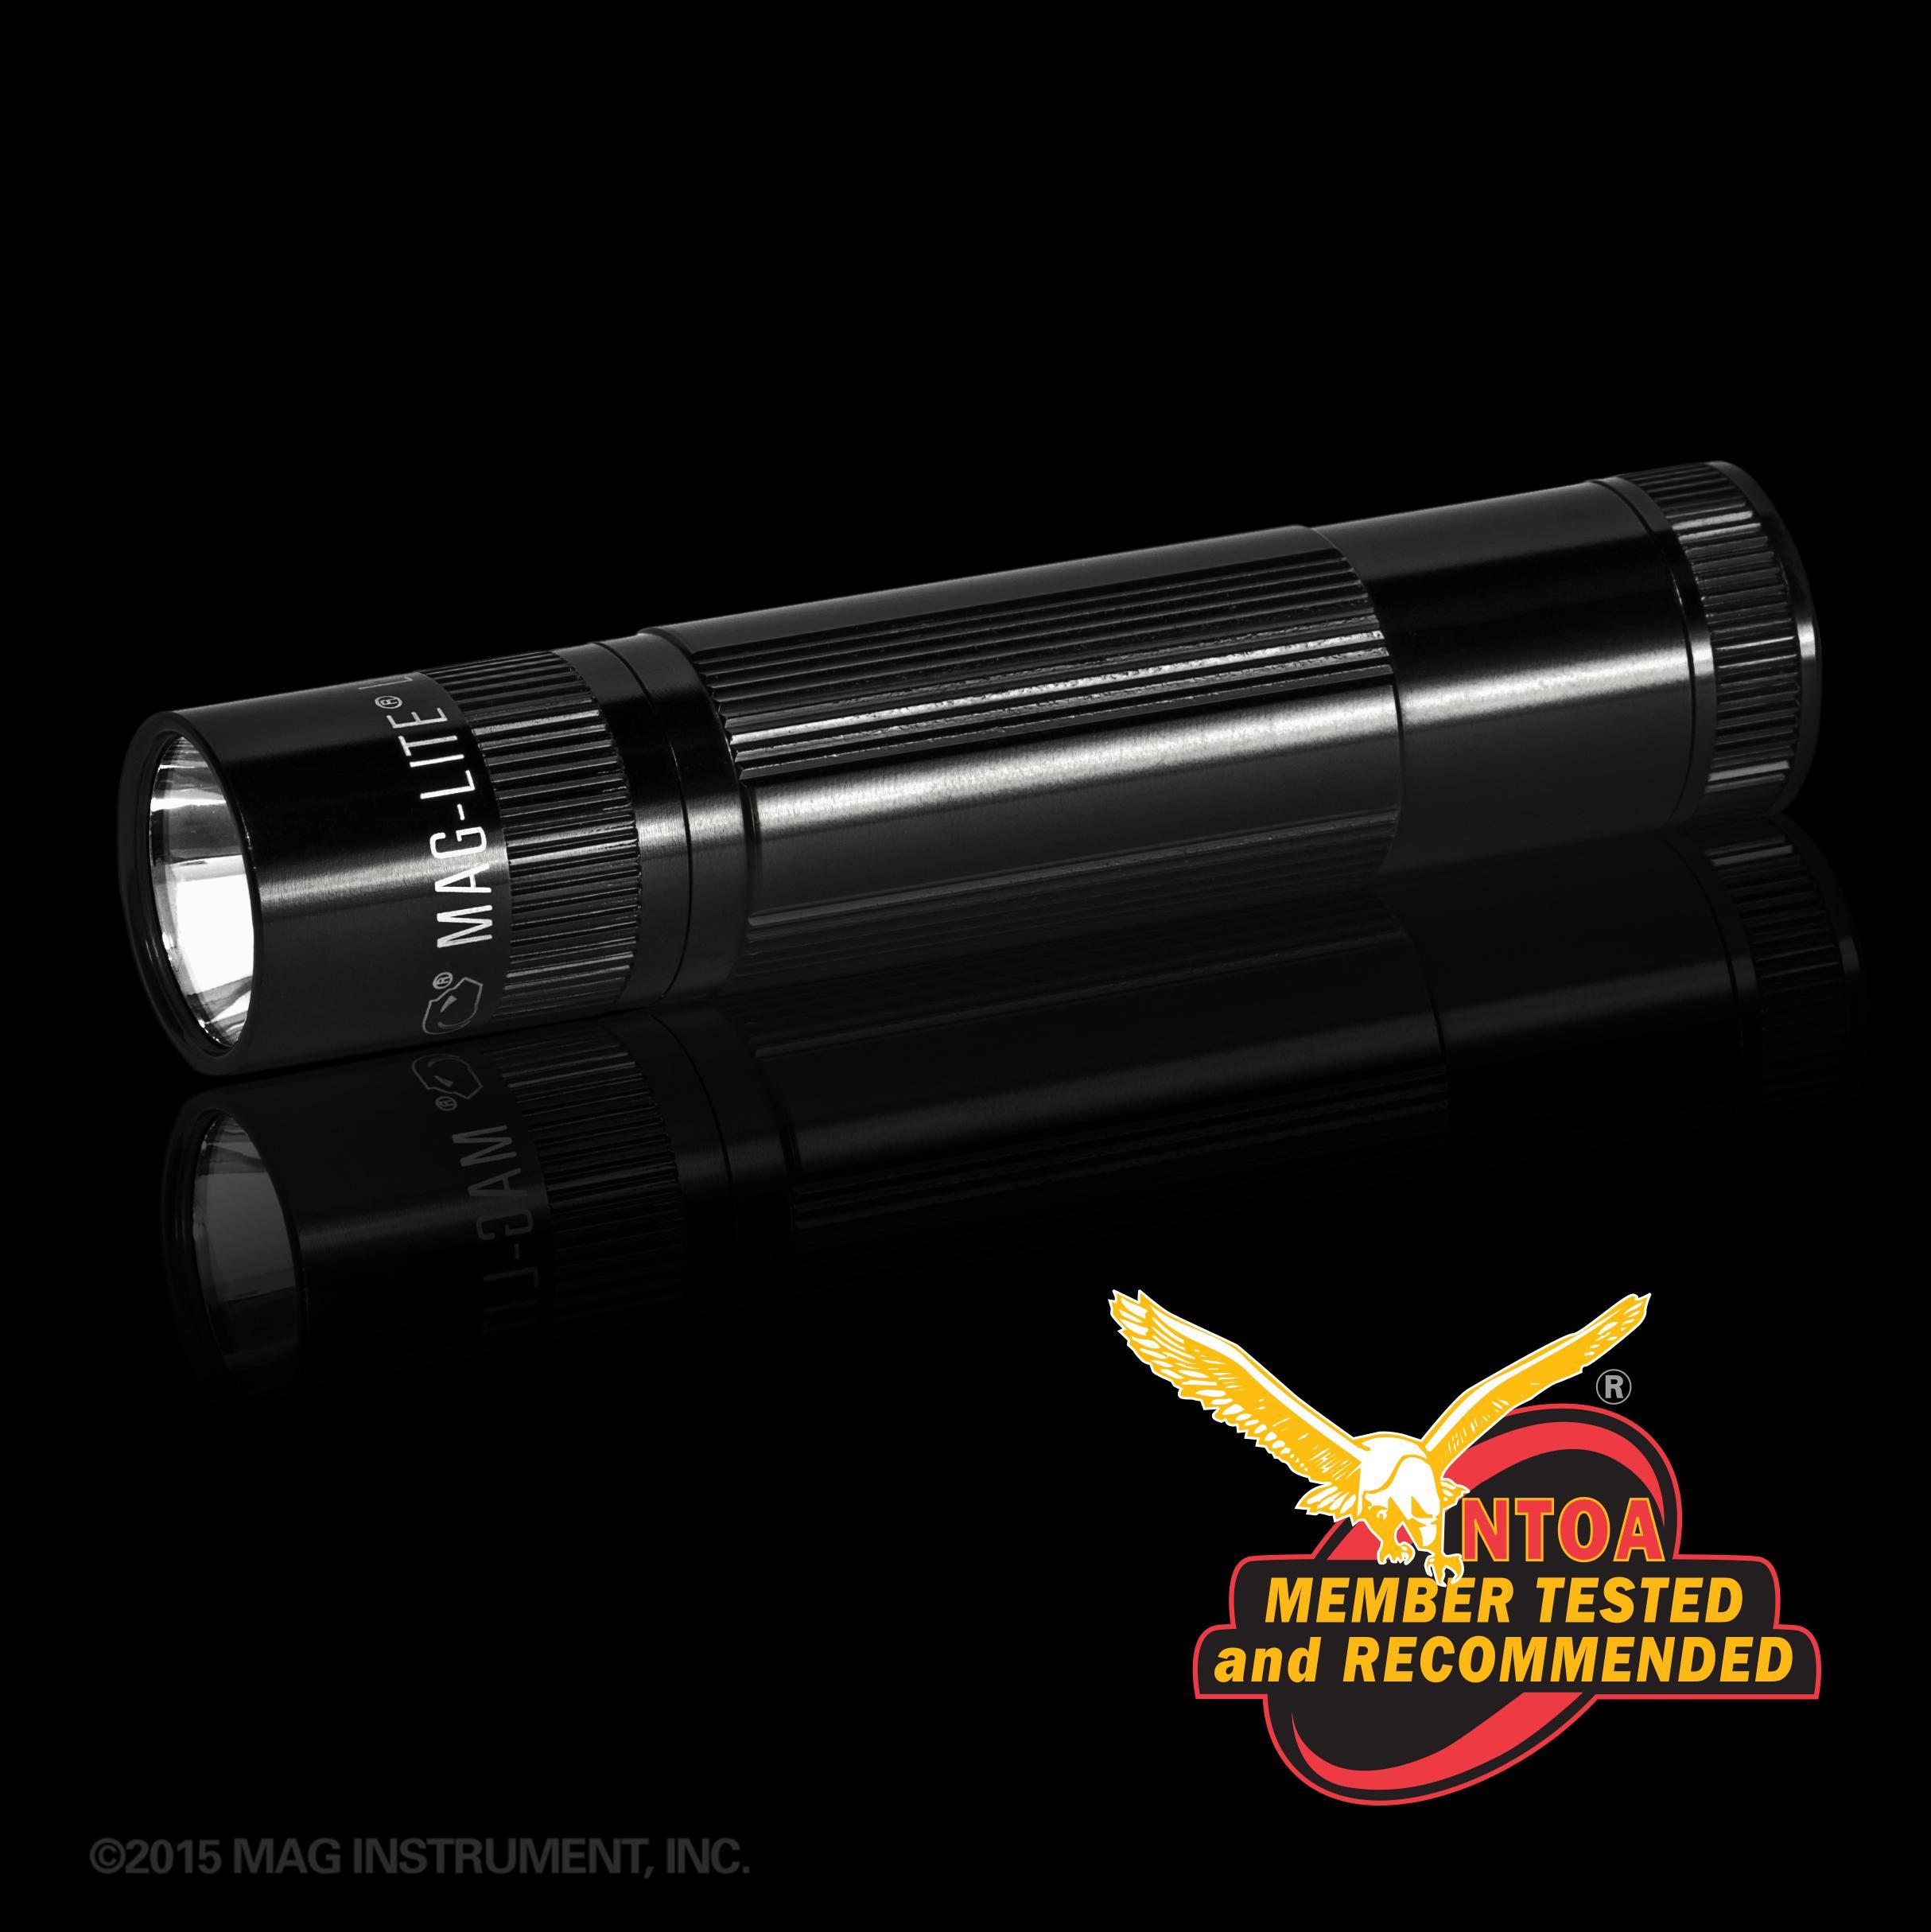 Maglite Xl200 Led 3 Cell Aaa Flashlight Black Basic